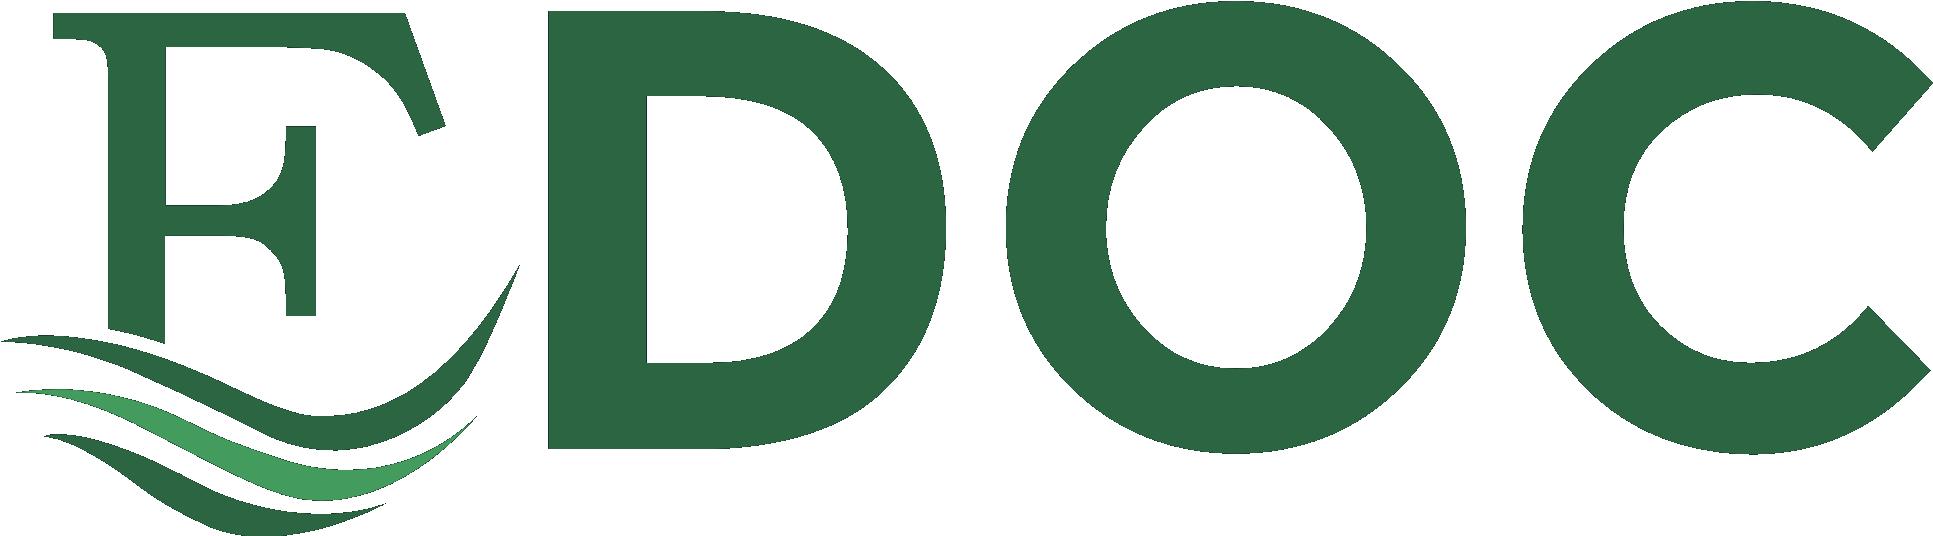 Afrikai szavanna – Wikipédia